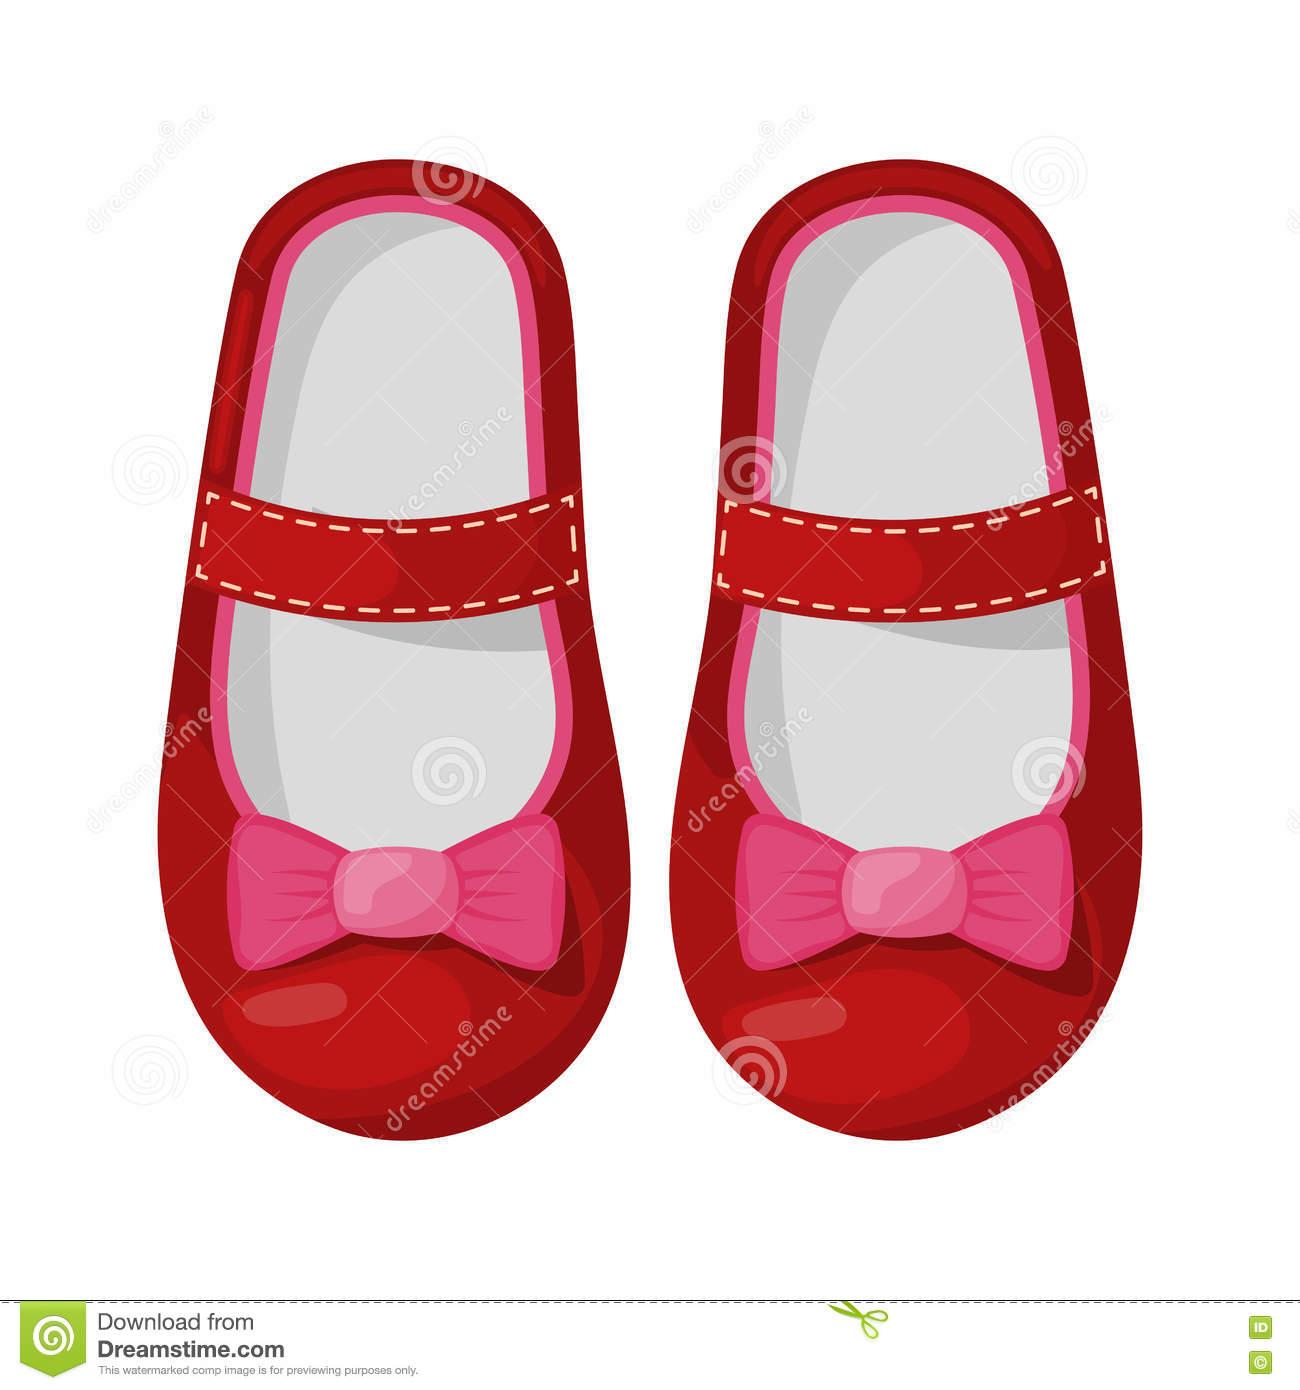 Girl shoe clipart clip art royalty free download Girl shoes clipart 4 » Clipart Station clip art royalty free download